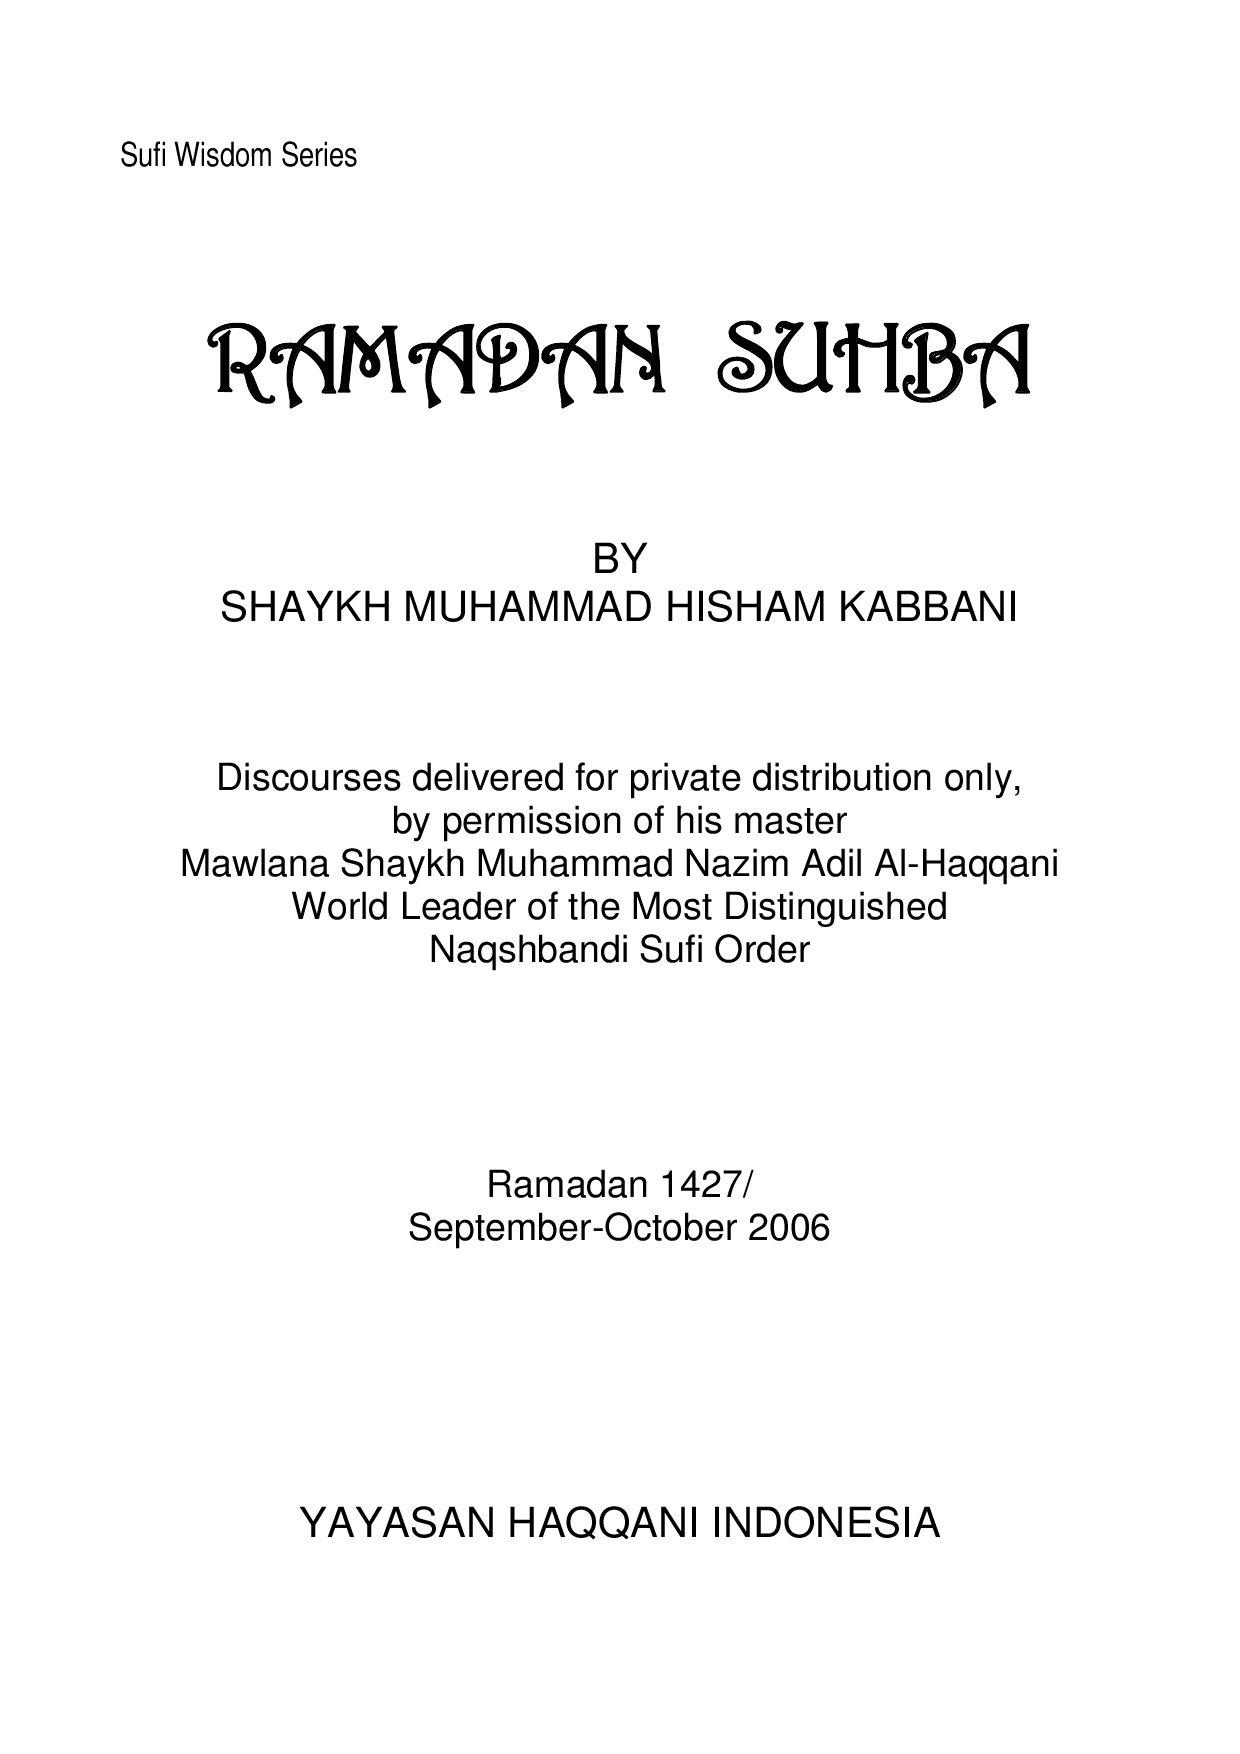 Idza Mata Ibnu Adama : adama, Reflection, Soul:, Ramadan, Suhba, Abdurrauf, Kurniadi, Issuu